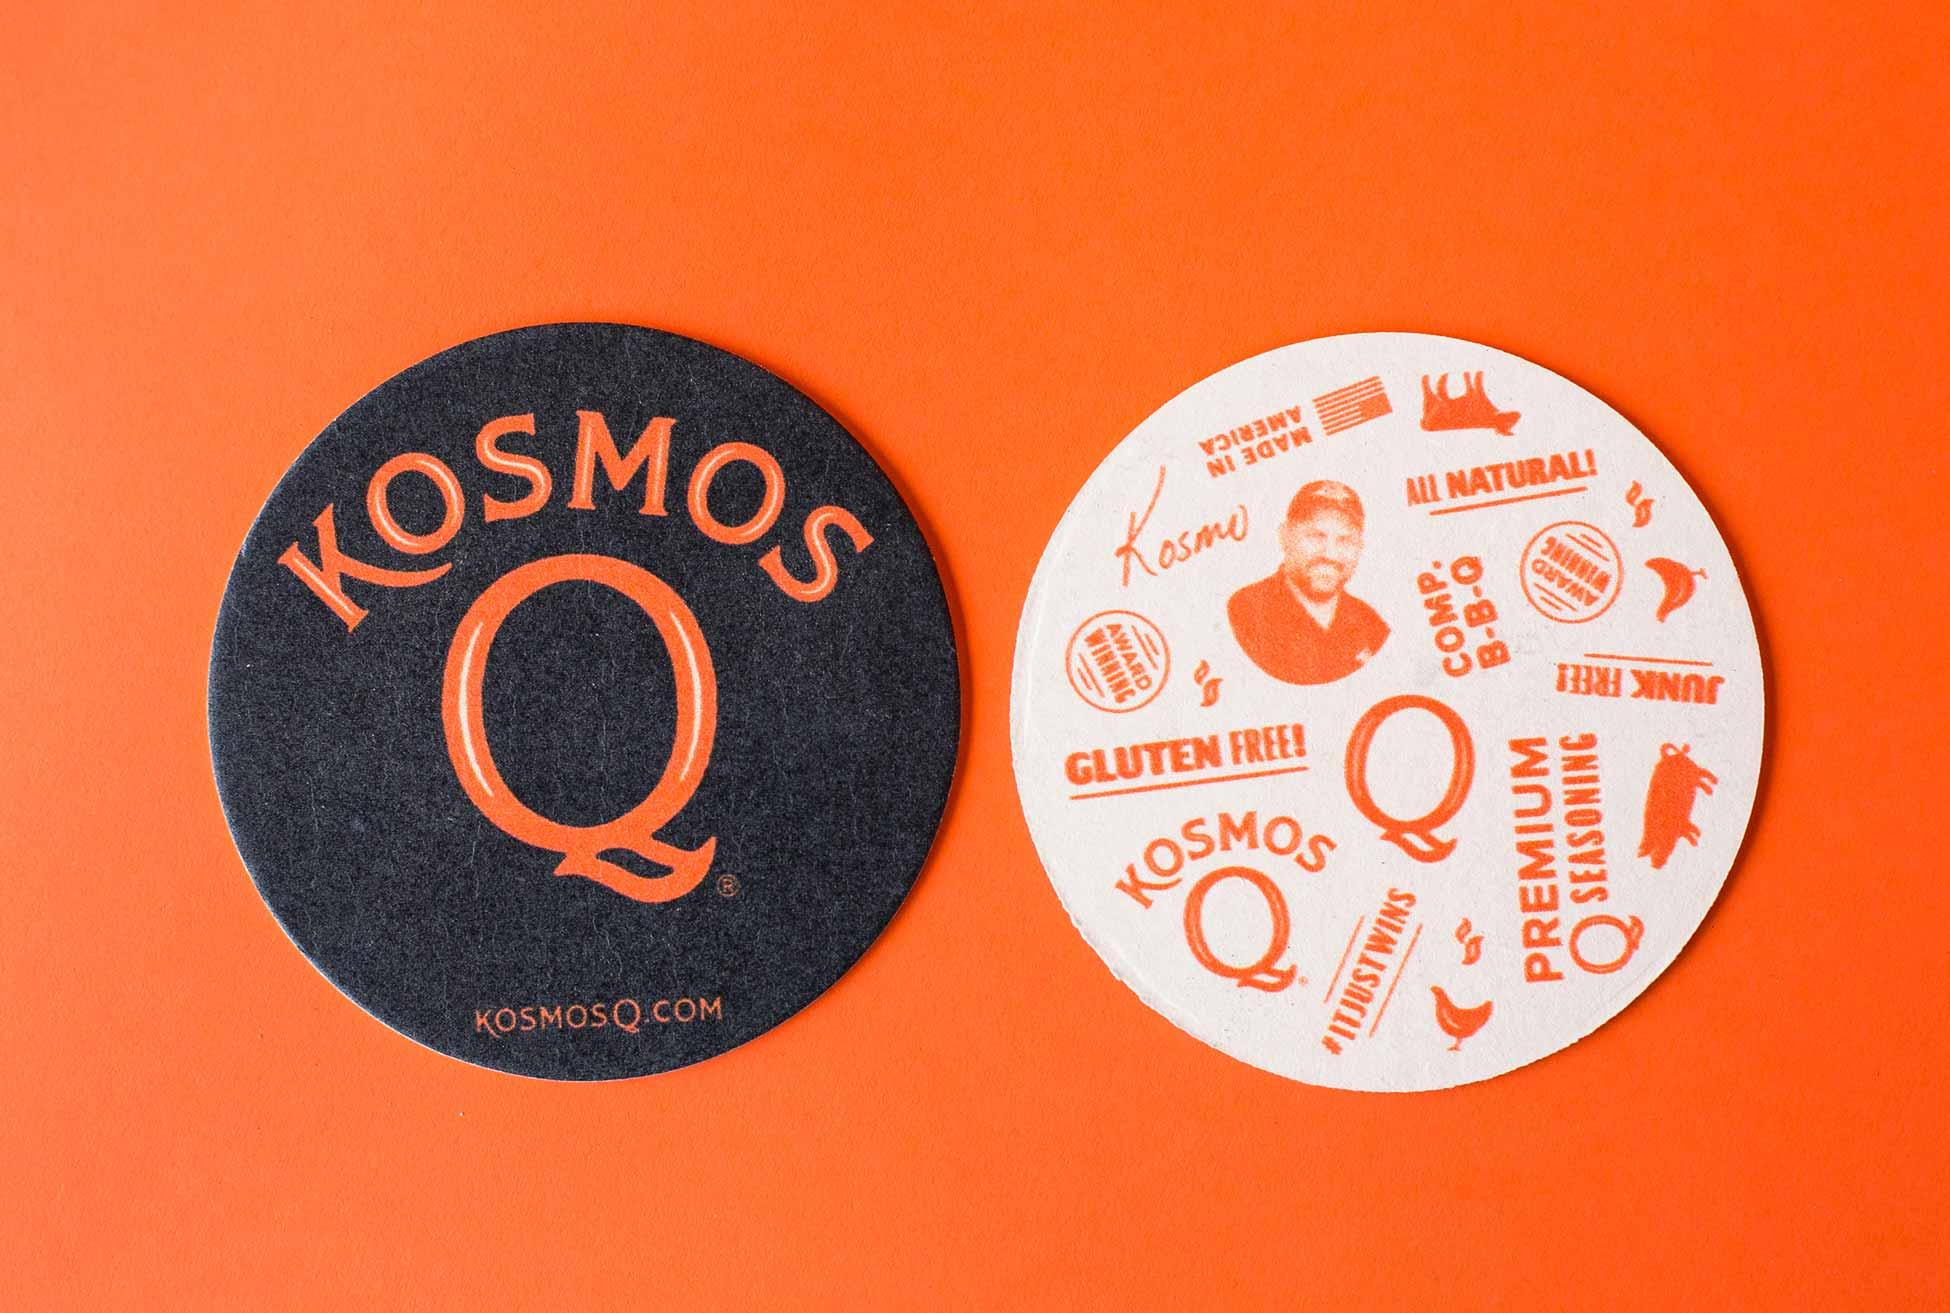 kosmosq_coaster.jpg